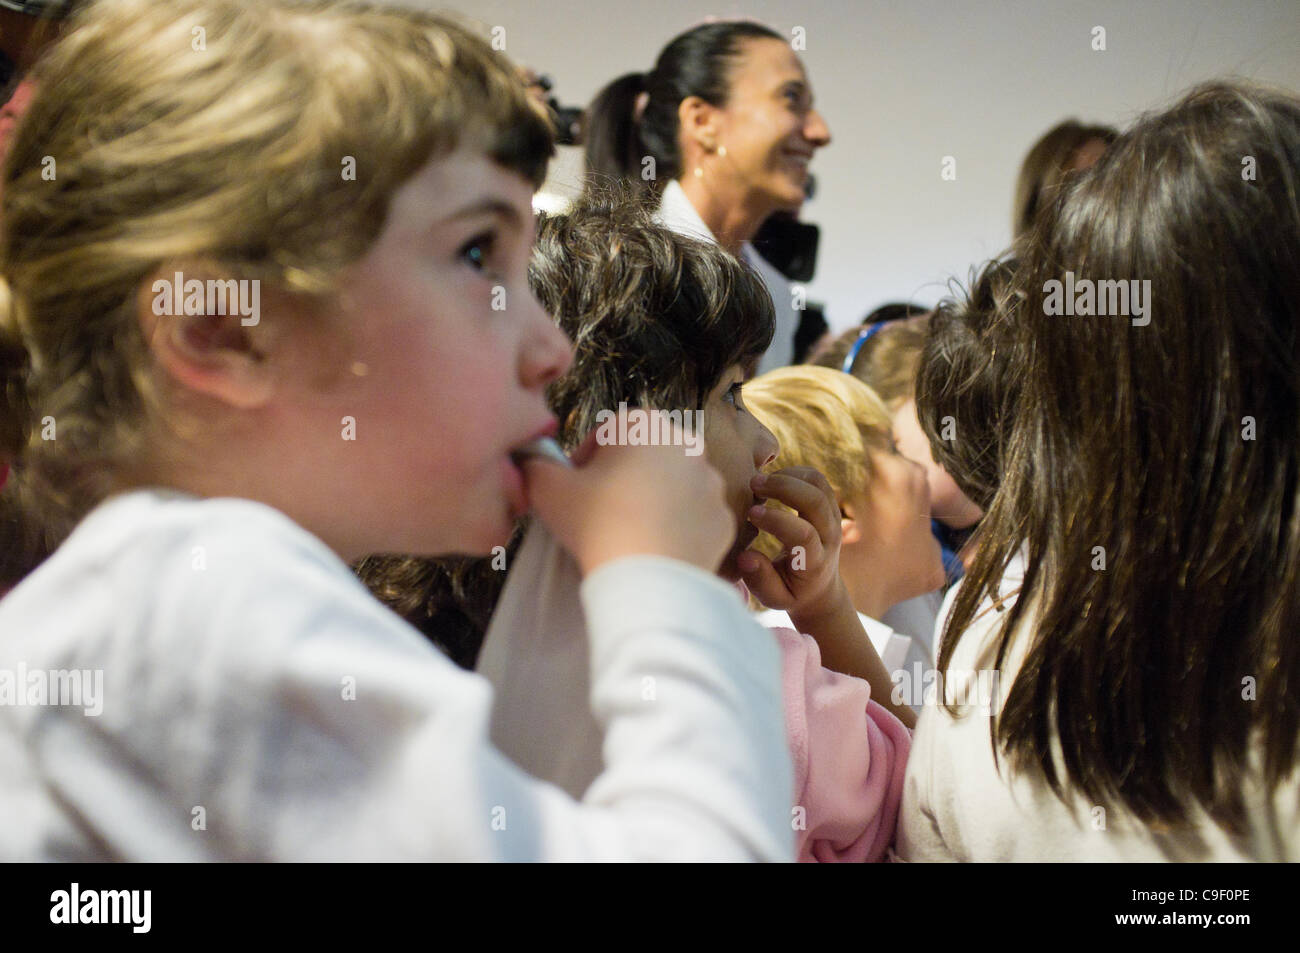 Speaker of the Knesset Reuven Rubi Rivlin and Minister of Education Gideon Saar interact with kindergarten children - Stock Image